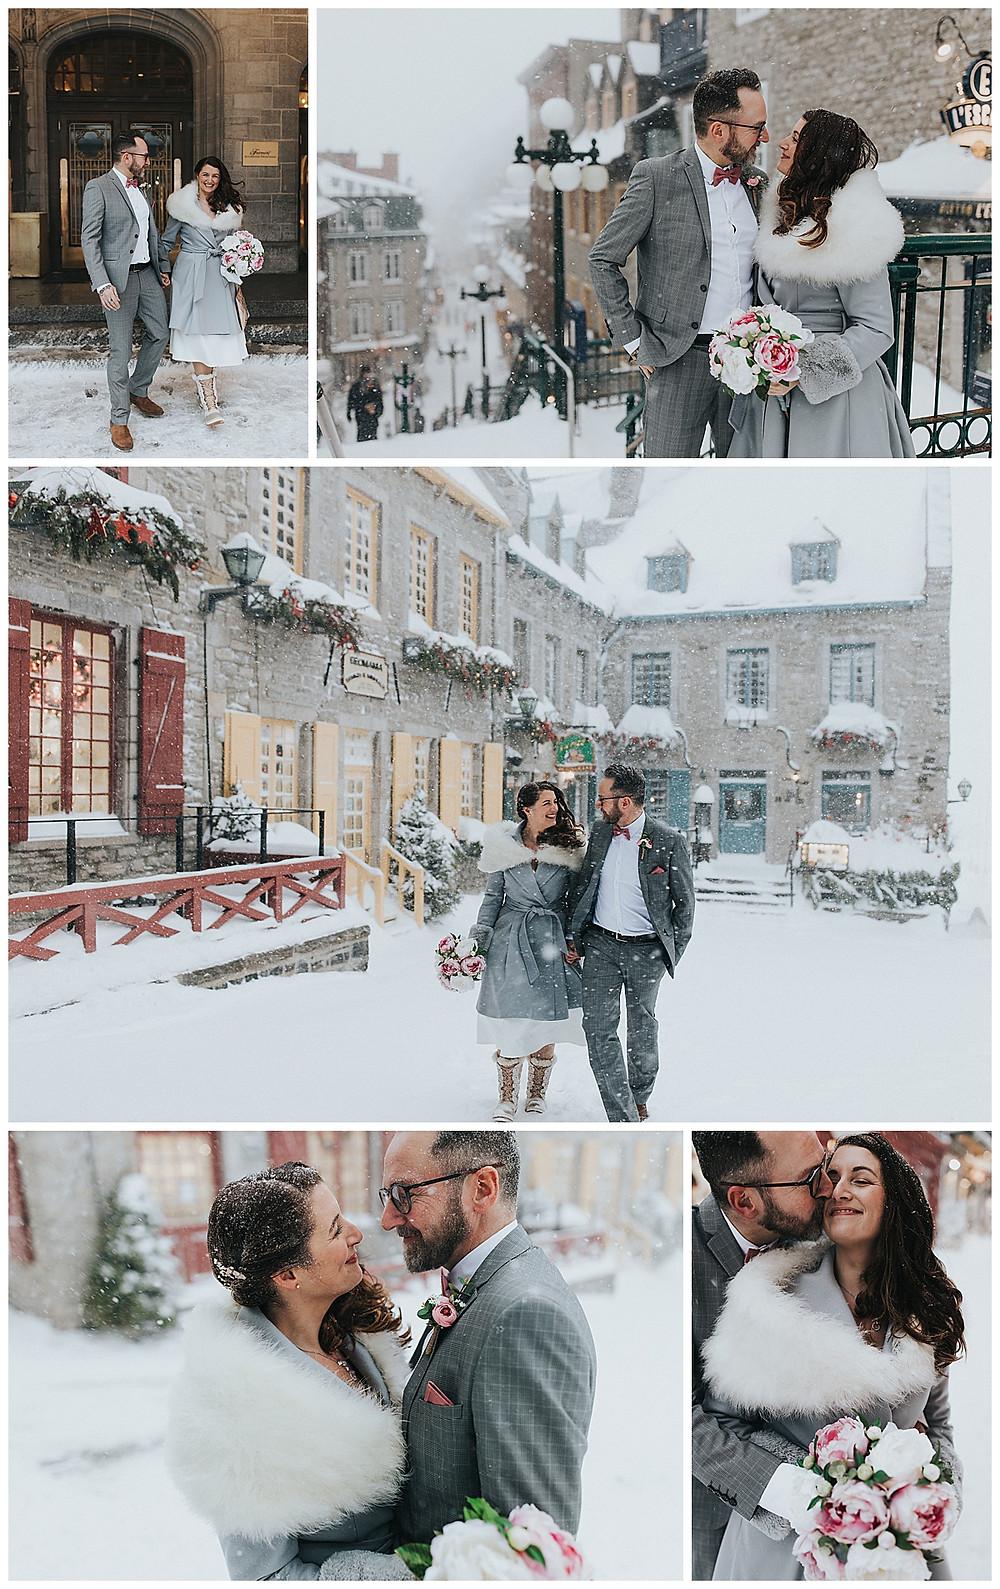 Mariage Ville de Québec wedding Quebec city